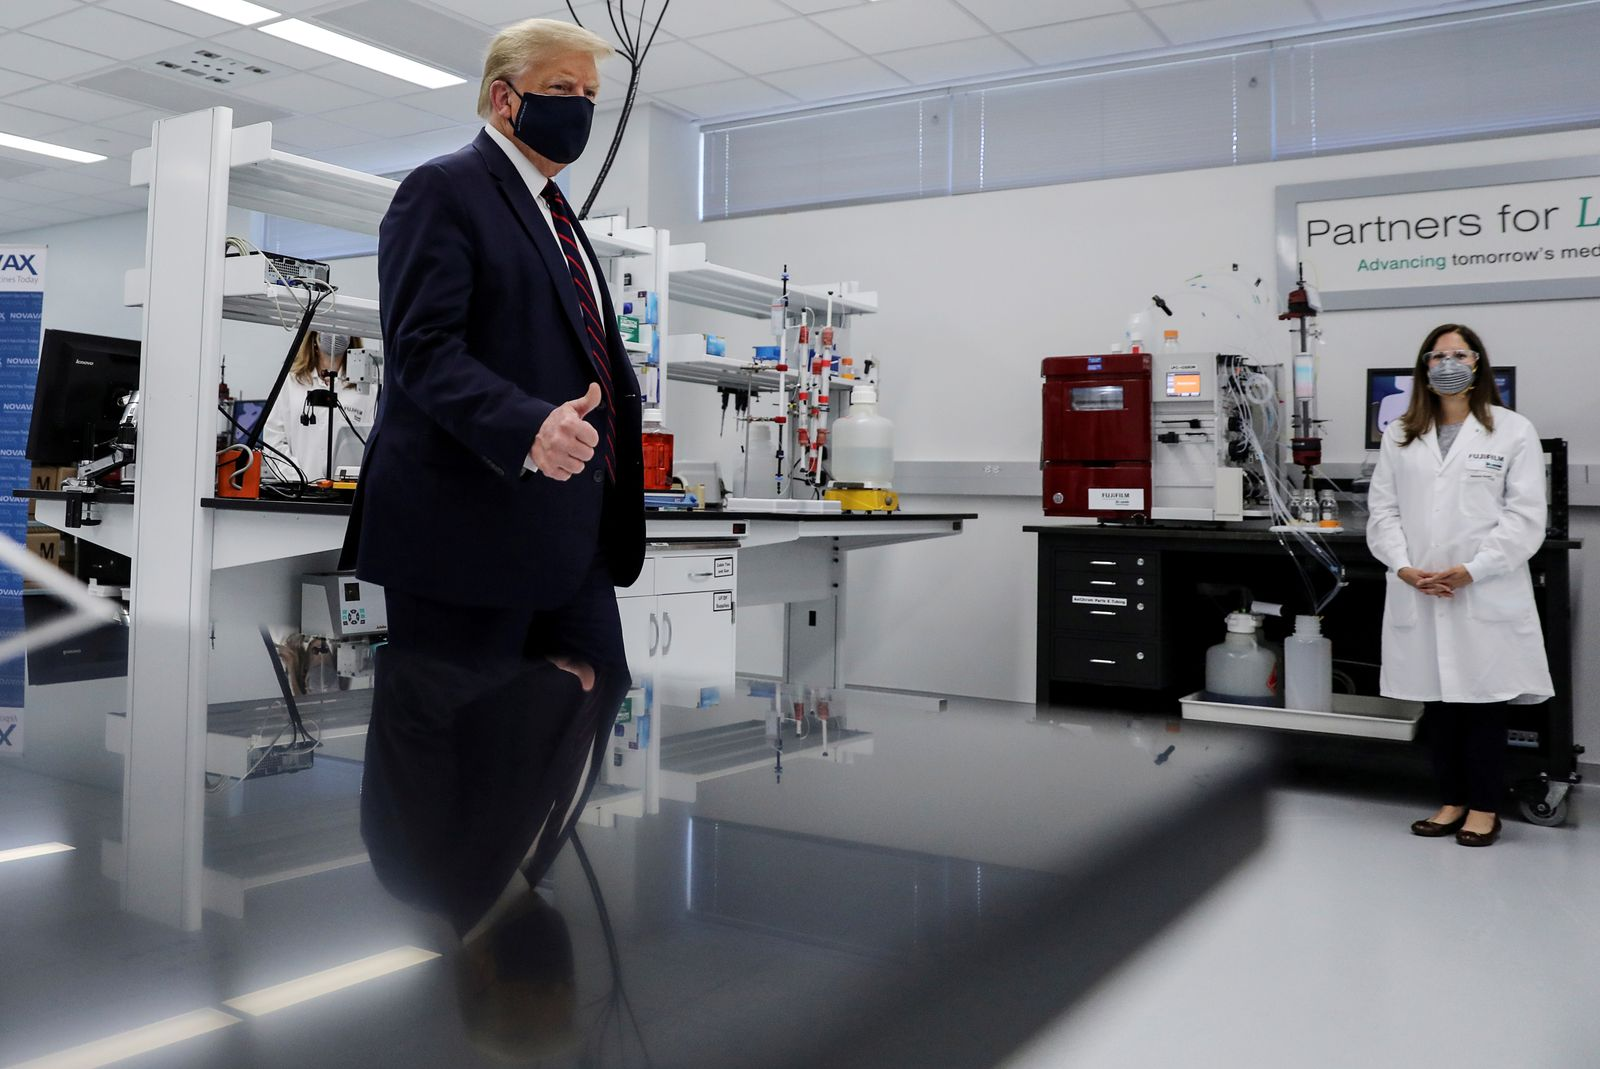 FILE PHOTO: U.S. President Trump visits Fujifilm Diosynth Biotechnologies' Innovation Center in Morrrisville, North Carolina